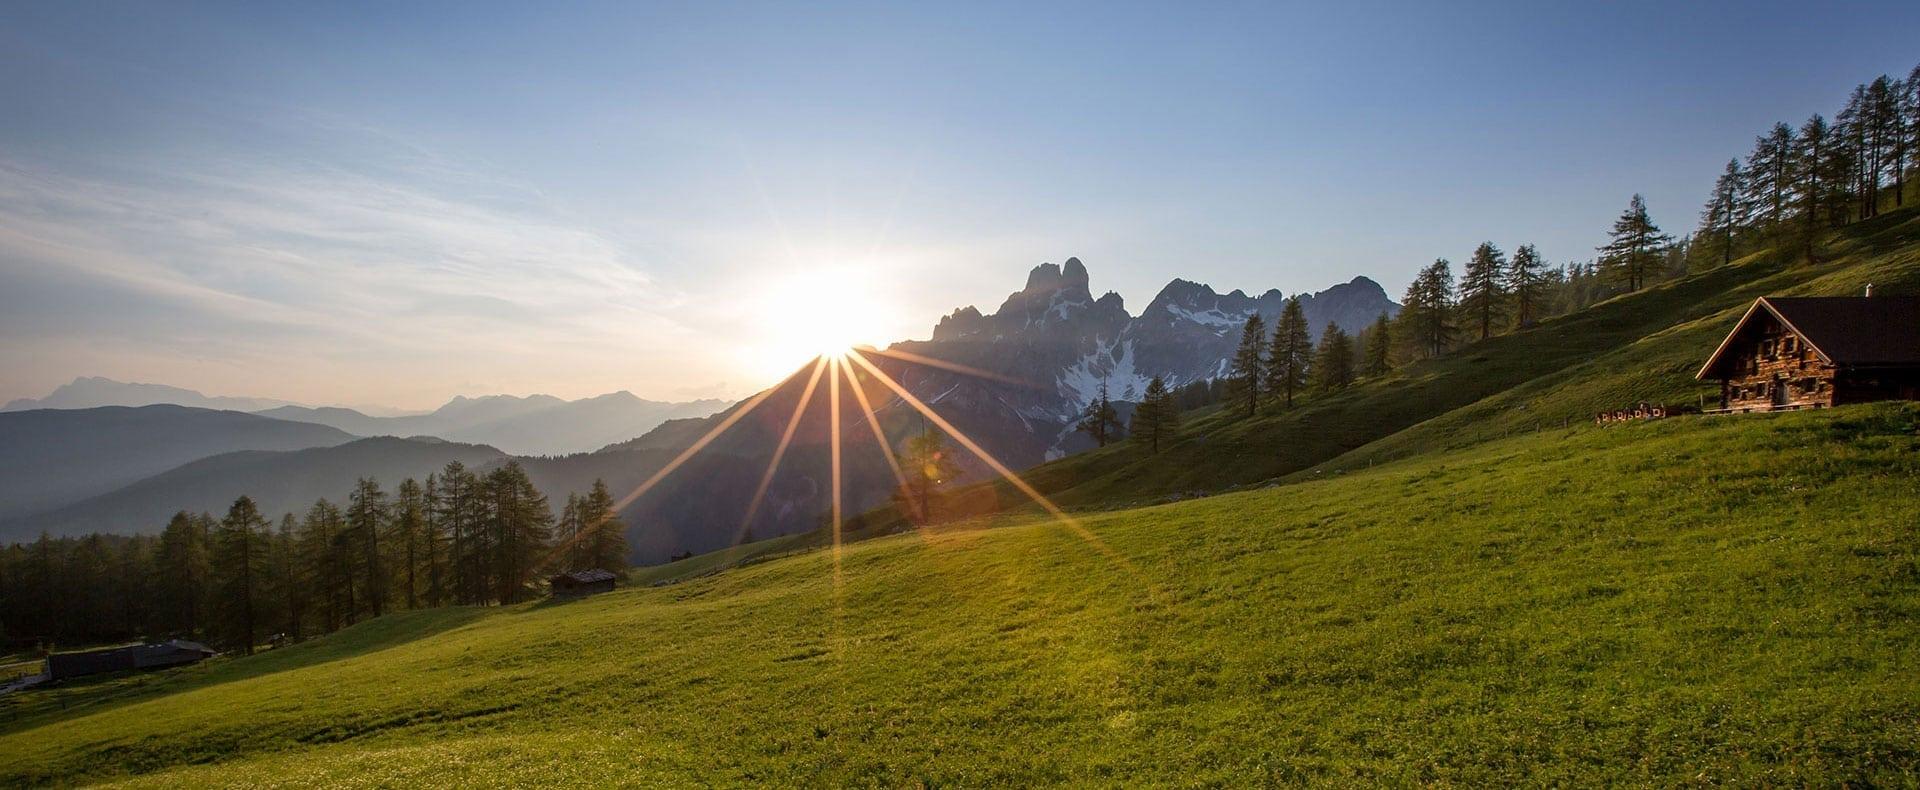 Urlaub in Filzmoos, Salzburger Land